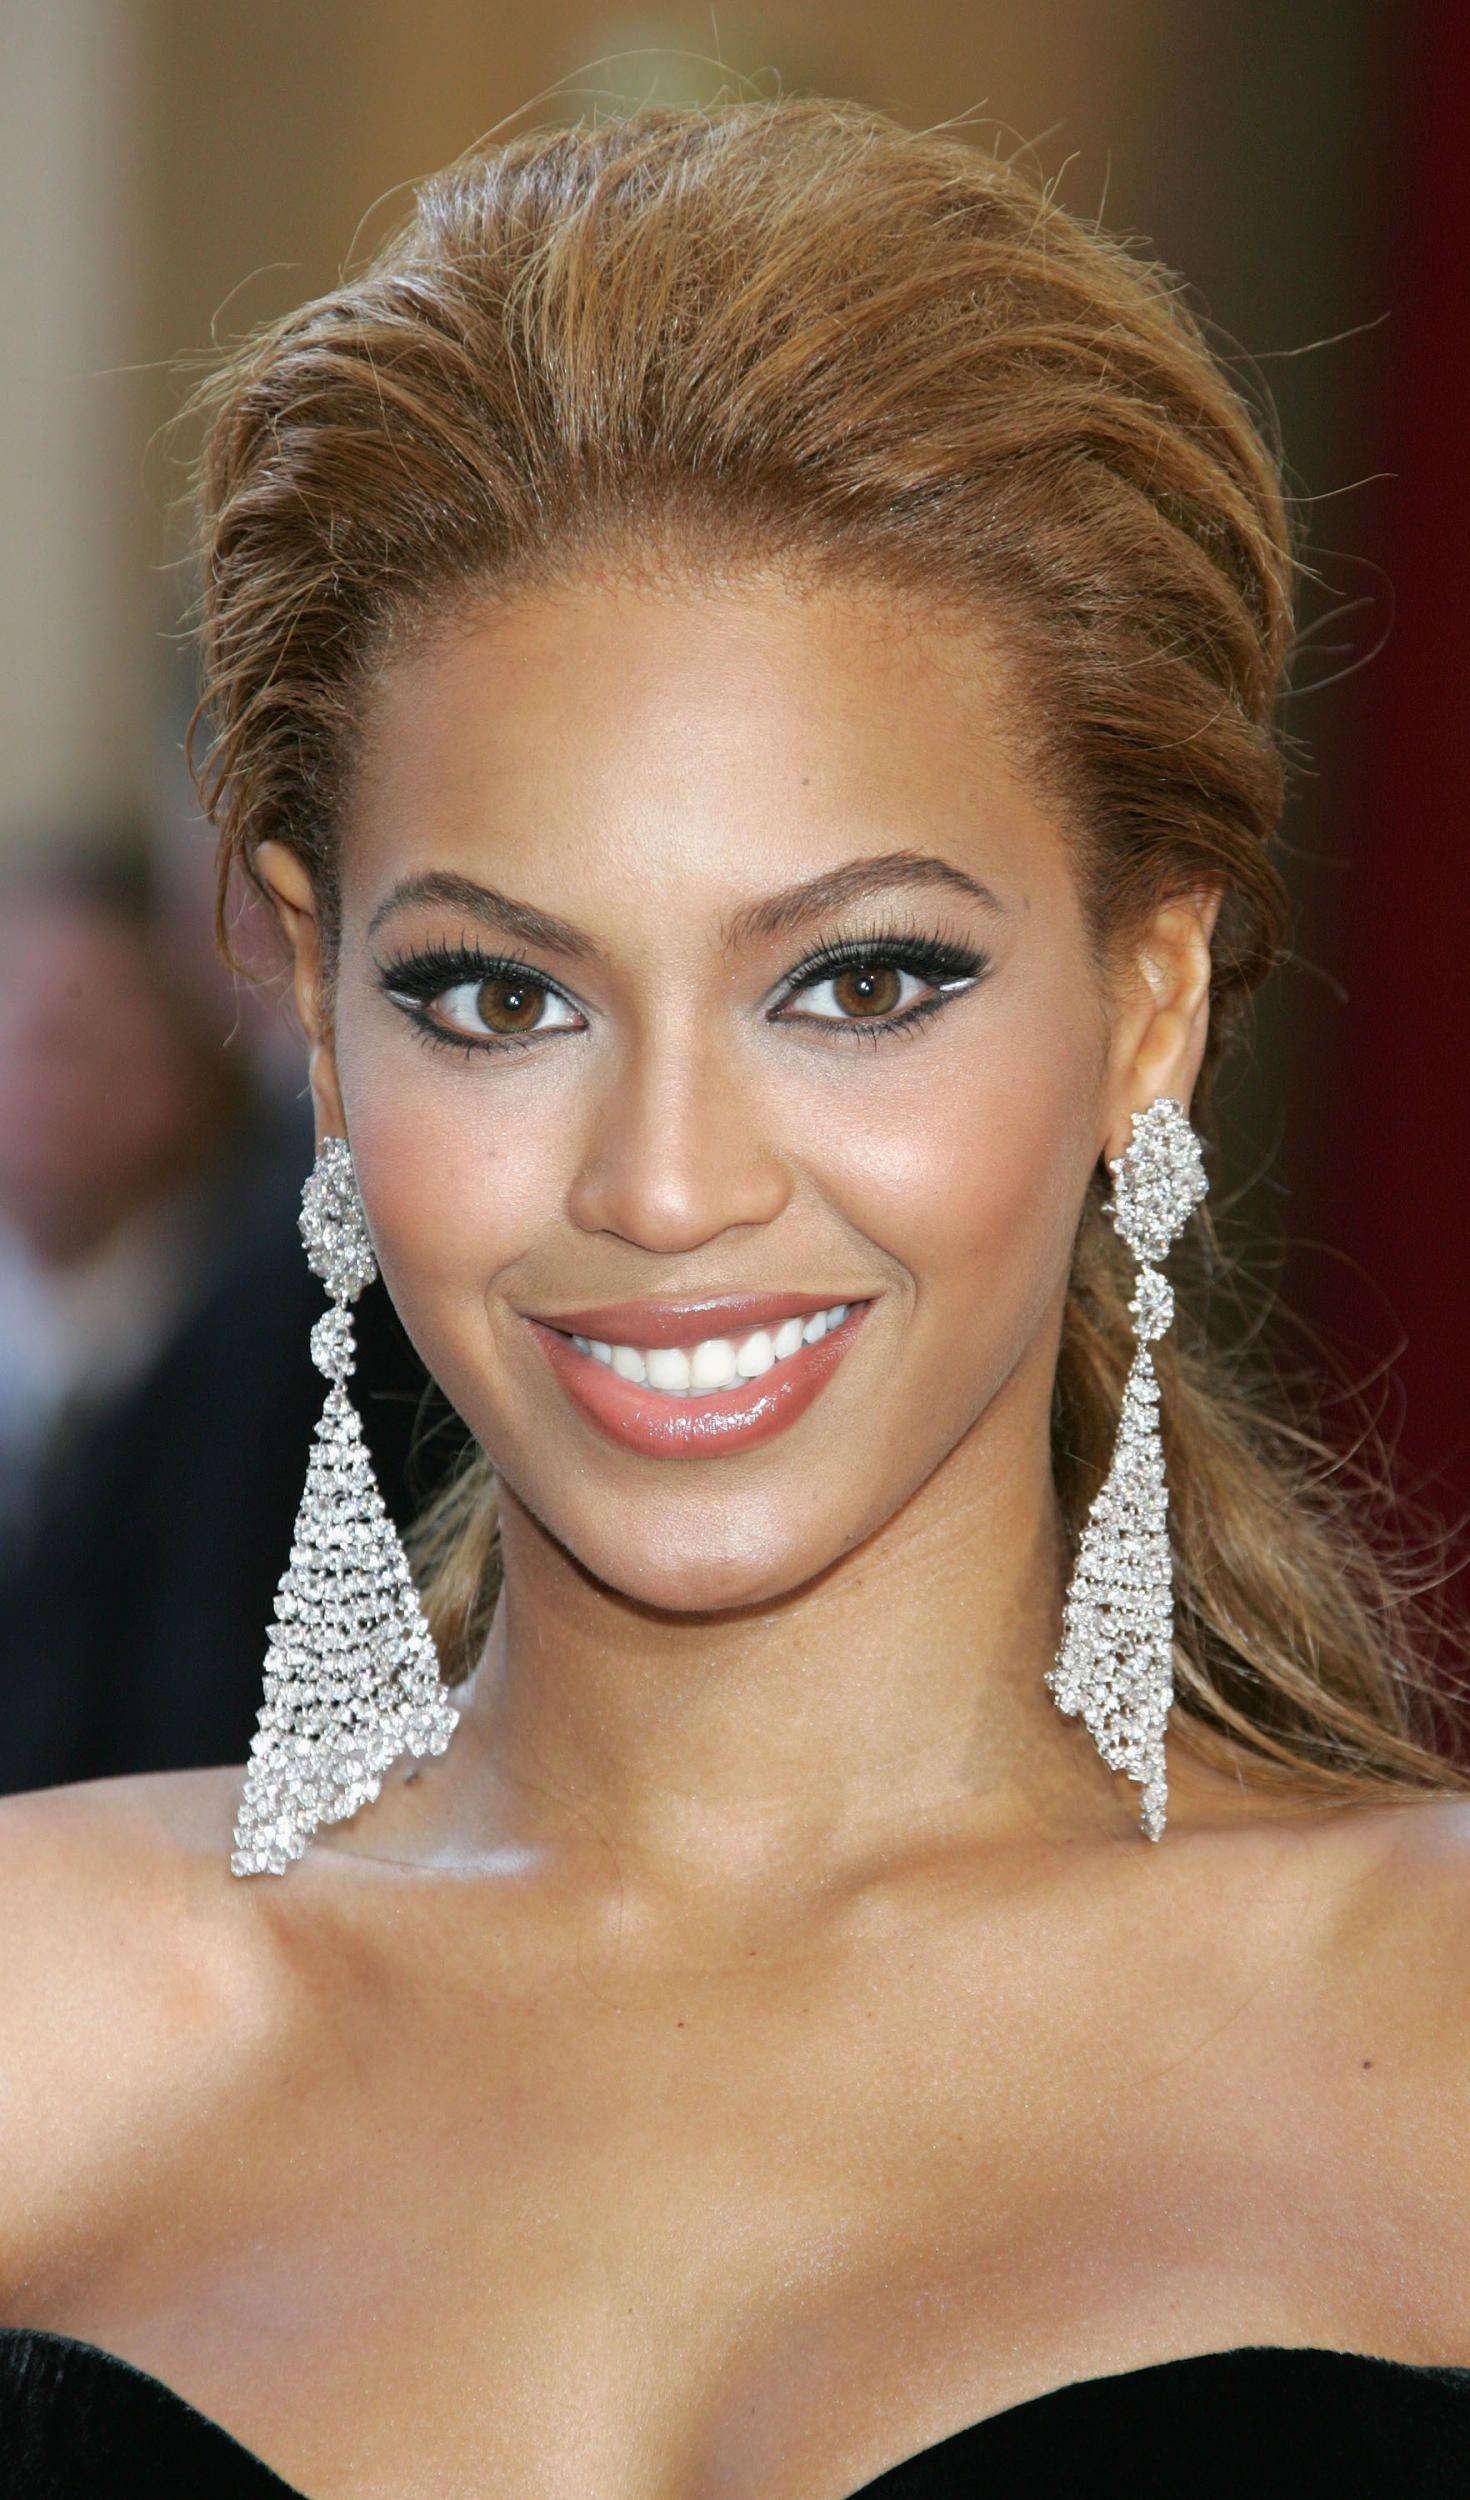 Beyonce Knowles Film Actress Singer Beyonce Makeup Beyonce Knowles Beyonce